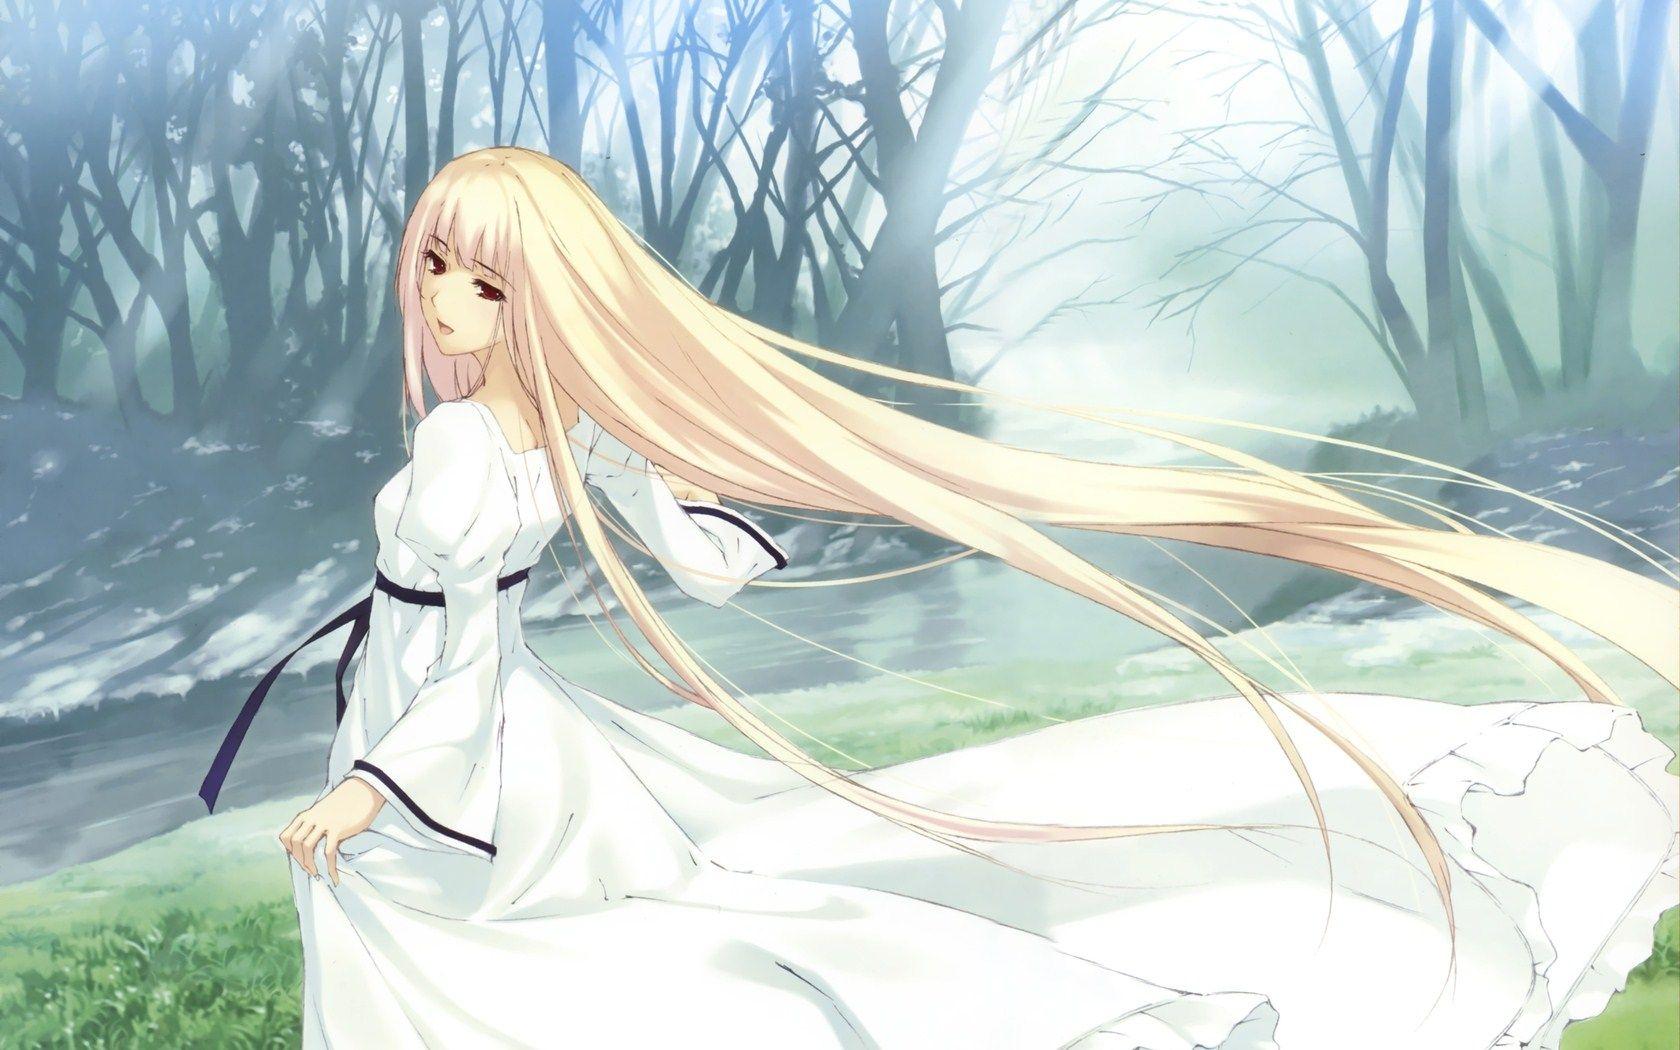 anime beautiful girl blonde long hair red eyes Obrazy